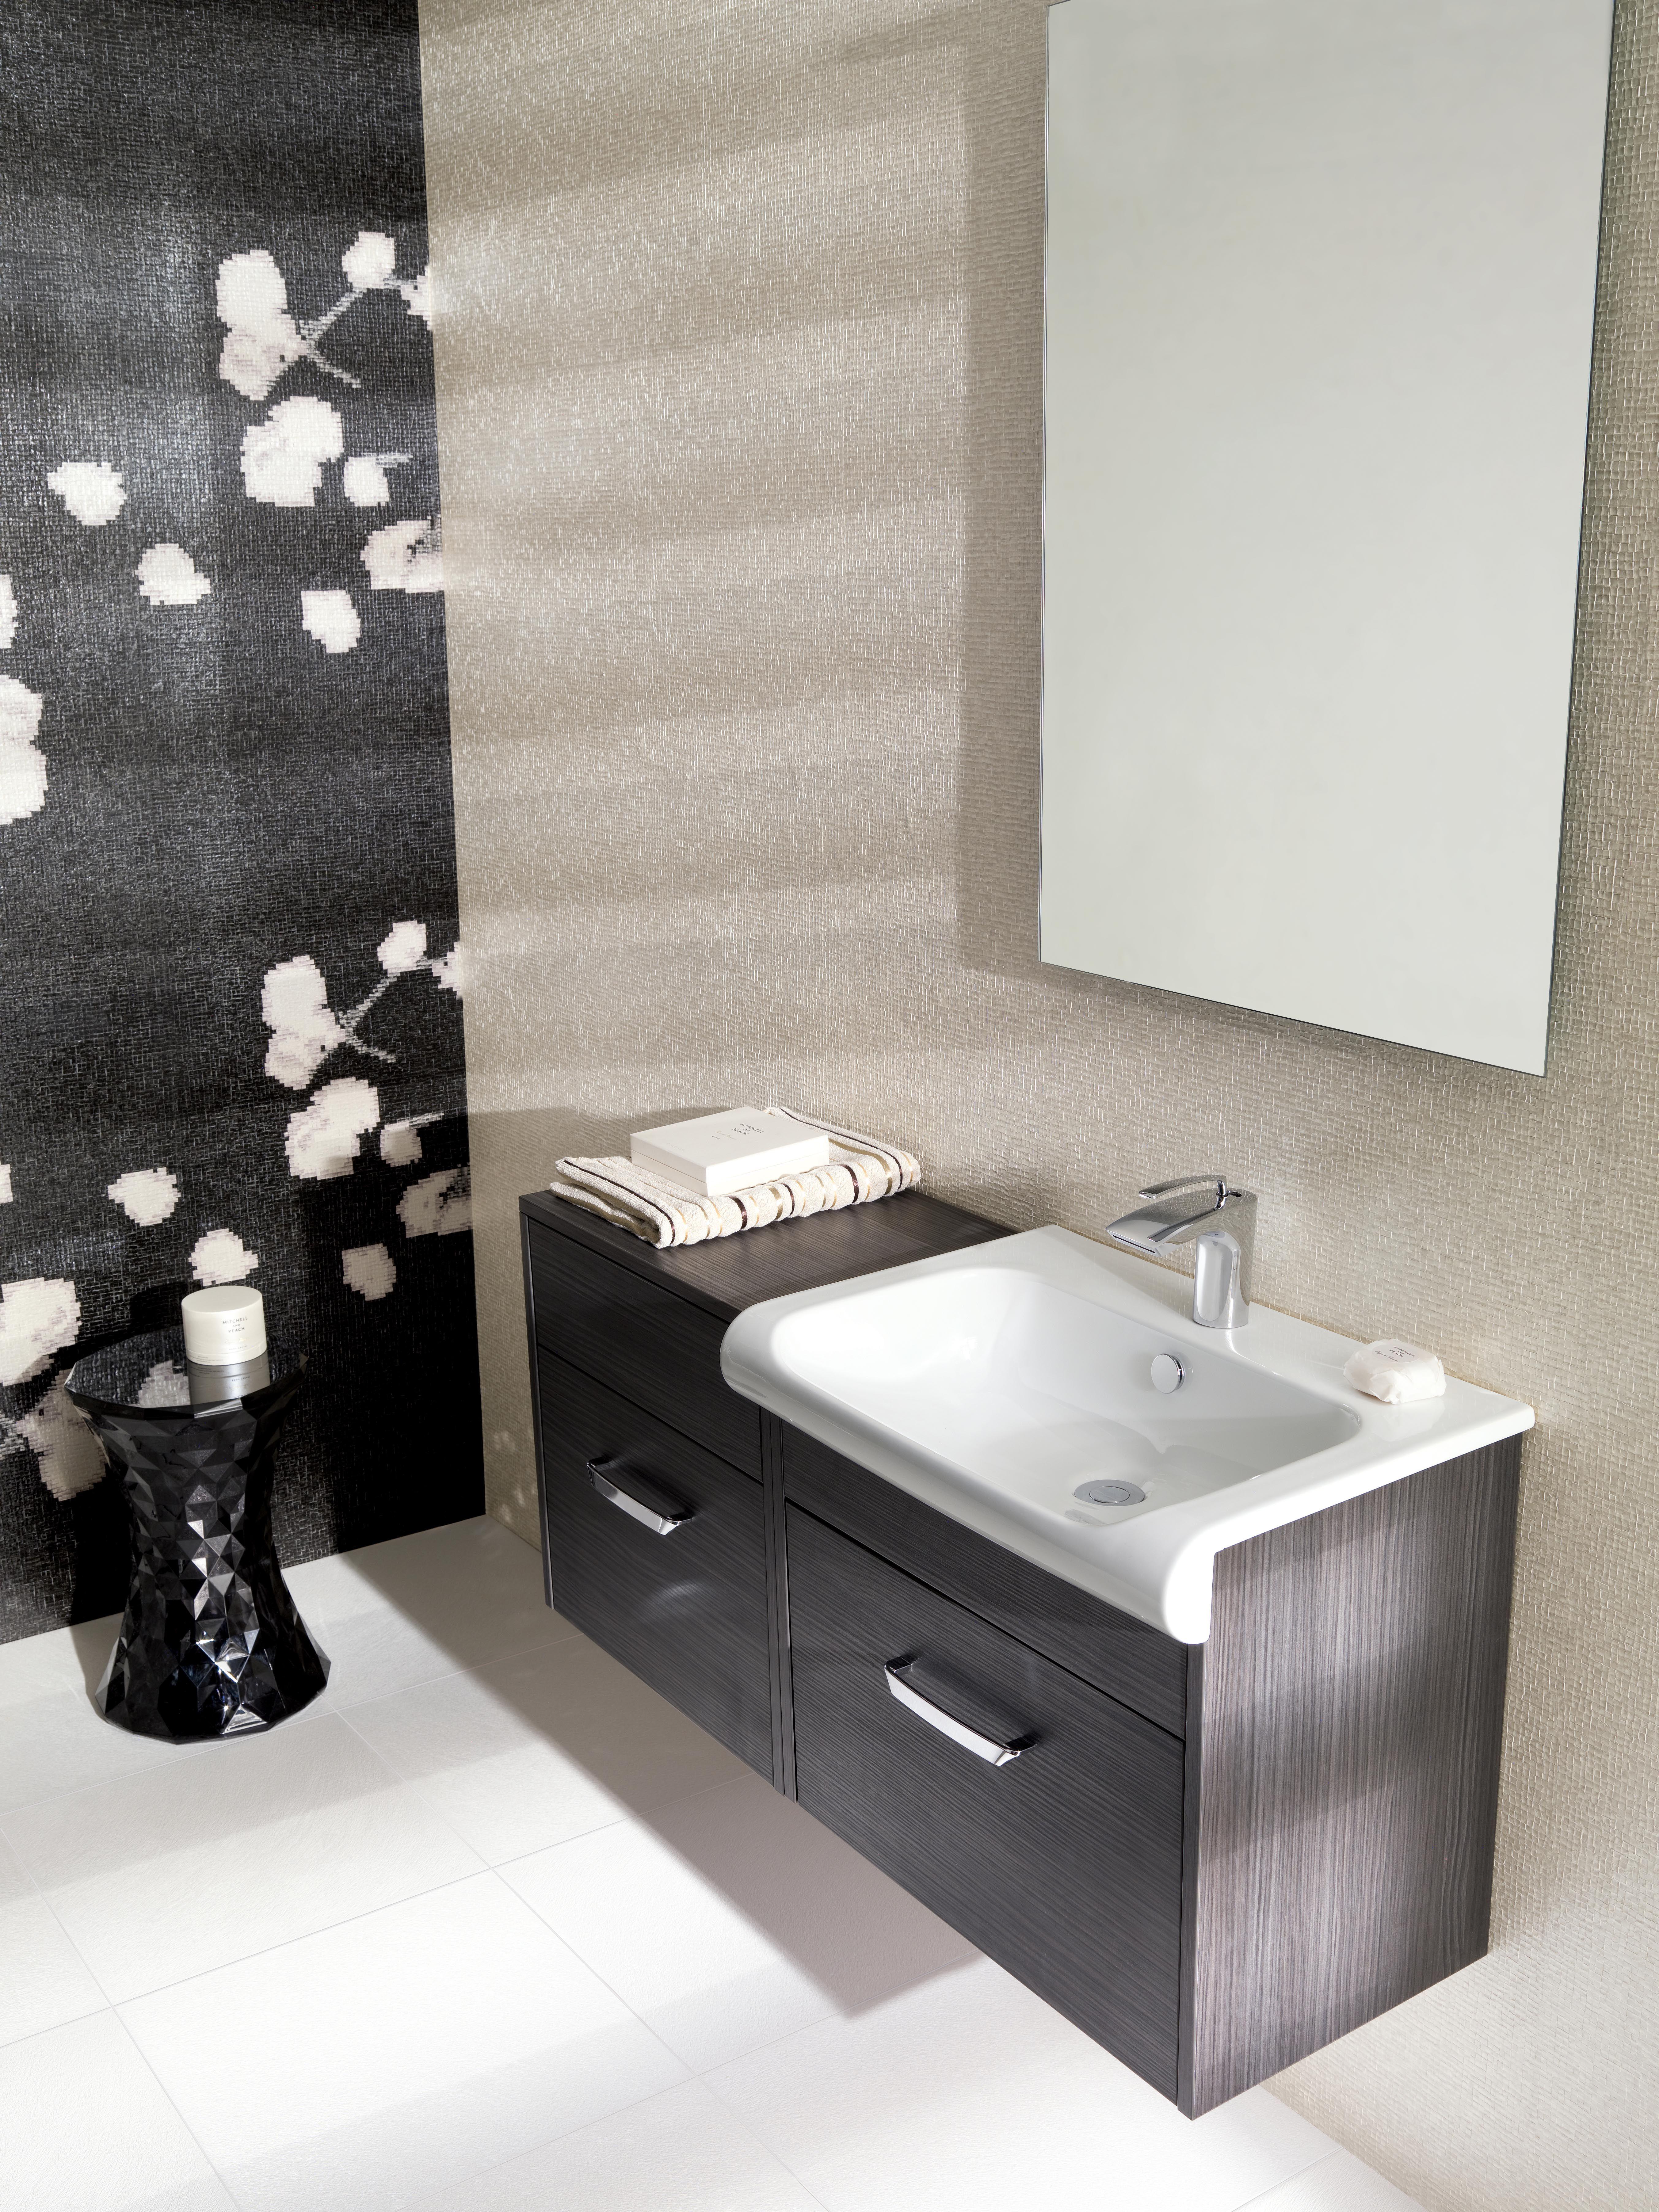 Bathroom units uk - Essence Anthracite Bathroom Furniture Range From Crosswater Http Www Bauhaus Bathrooms